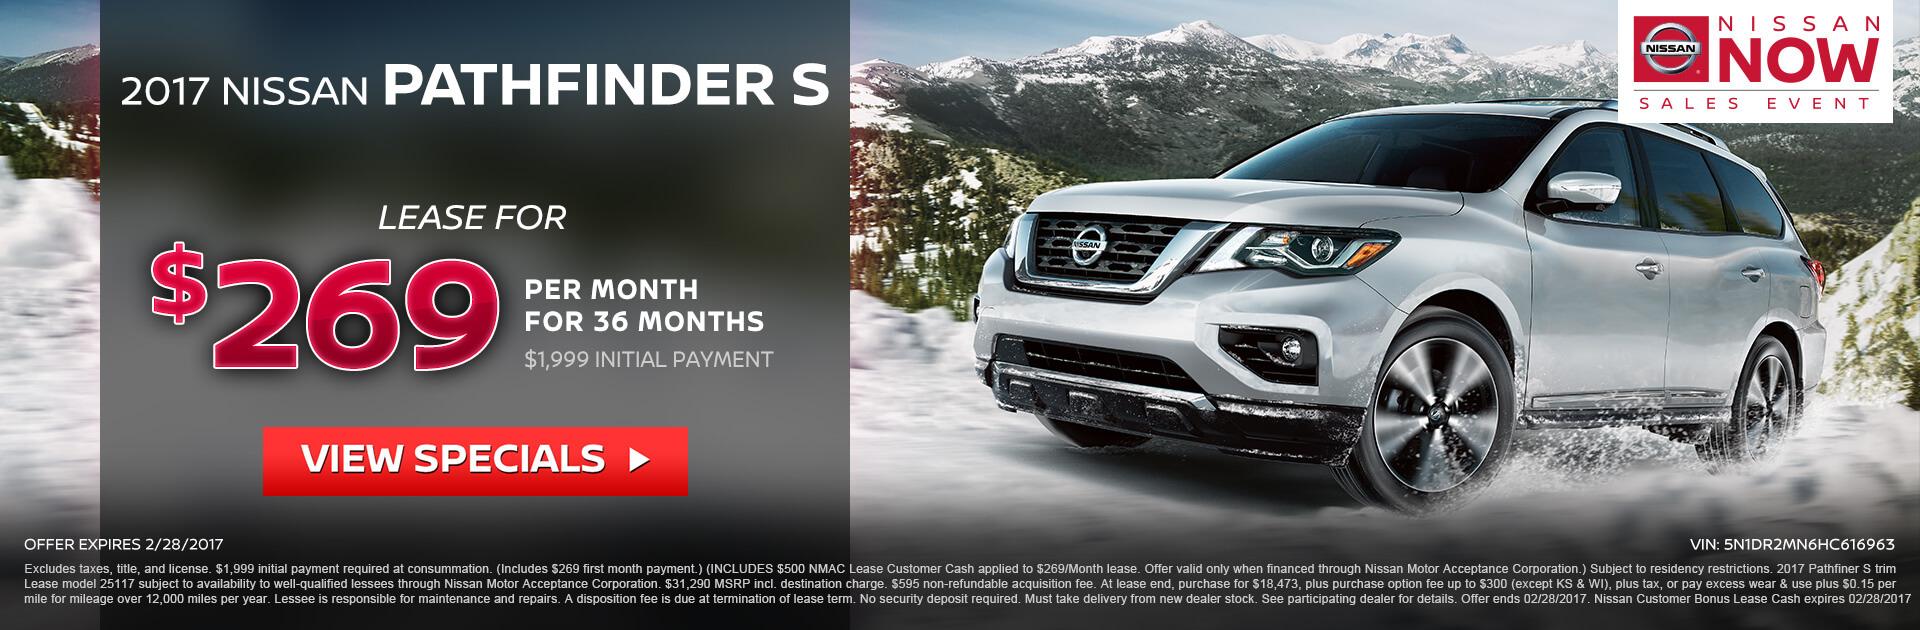 Pathfinder NEW